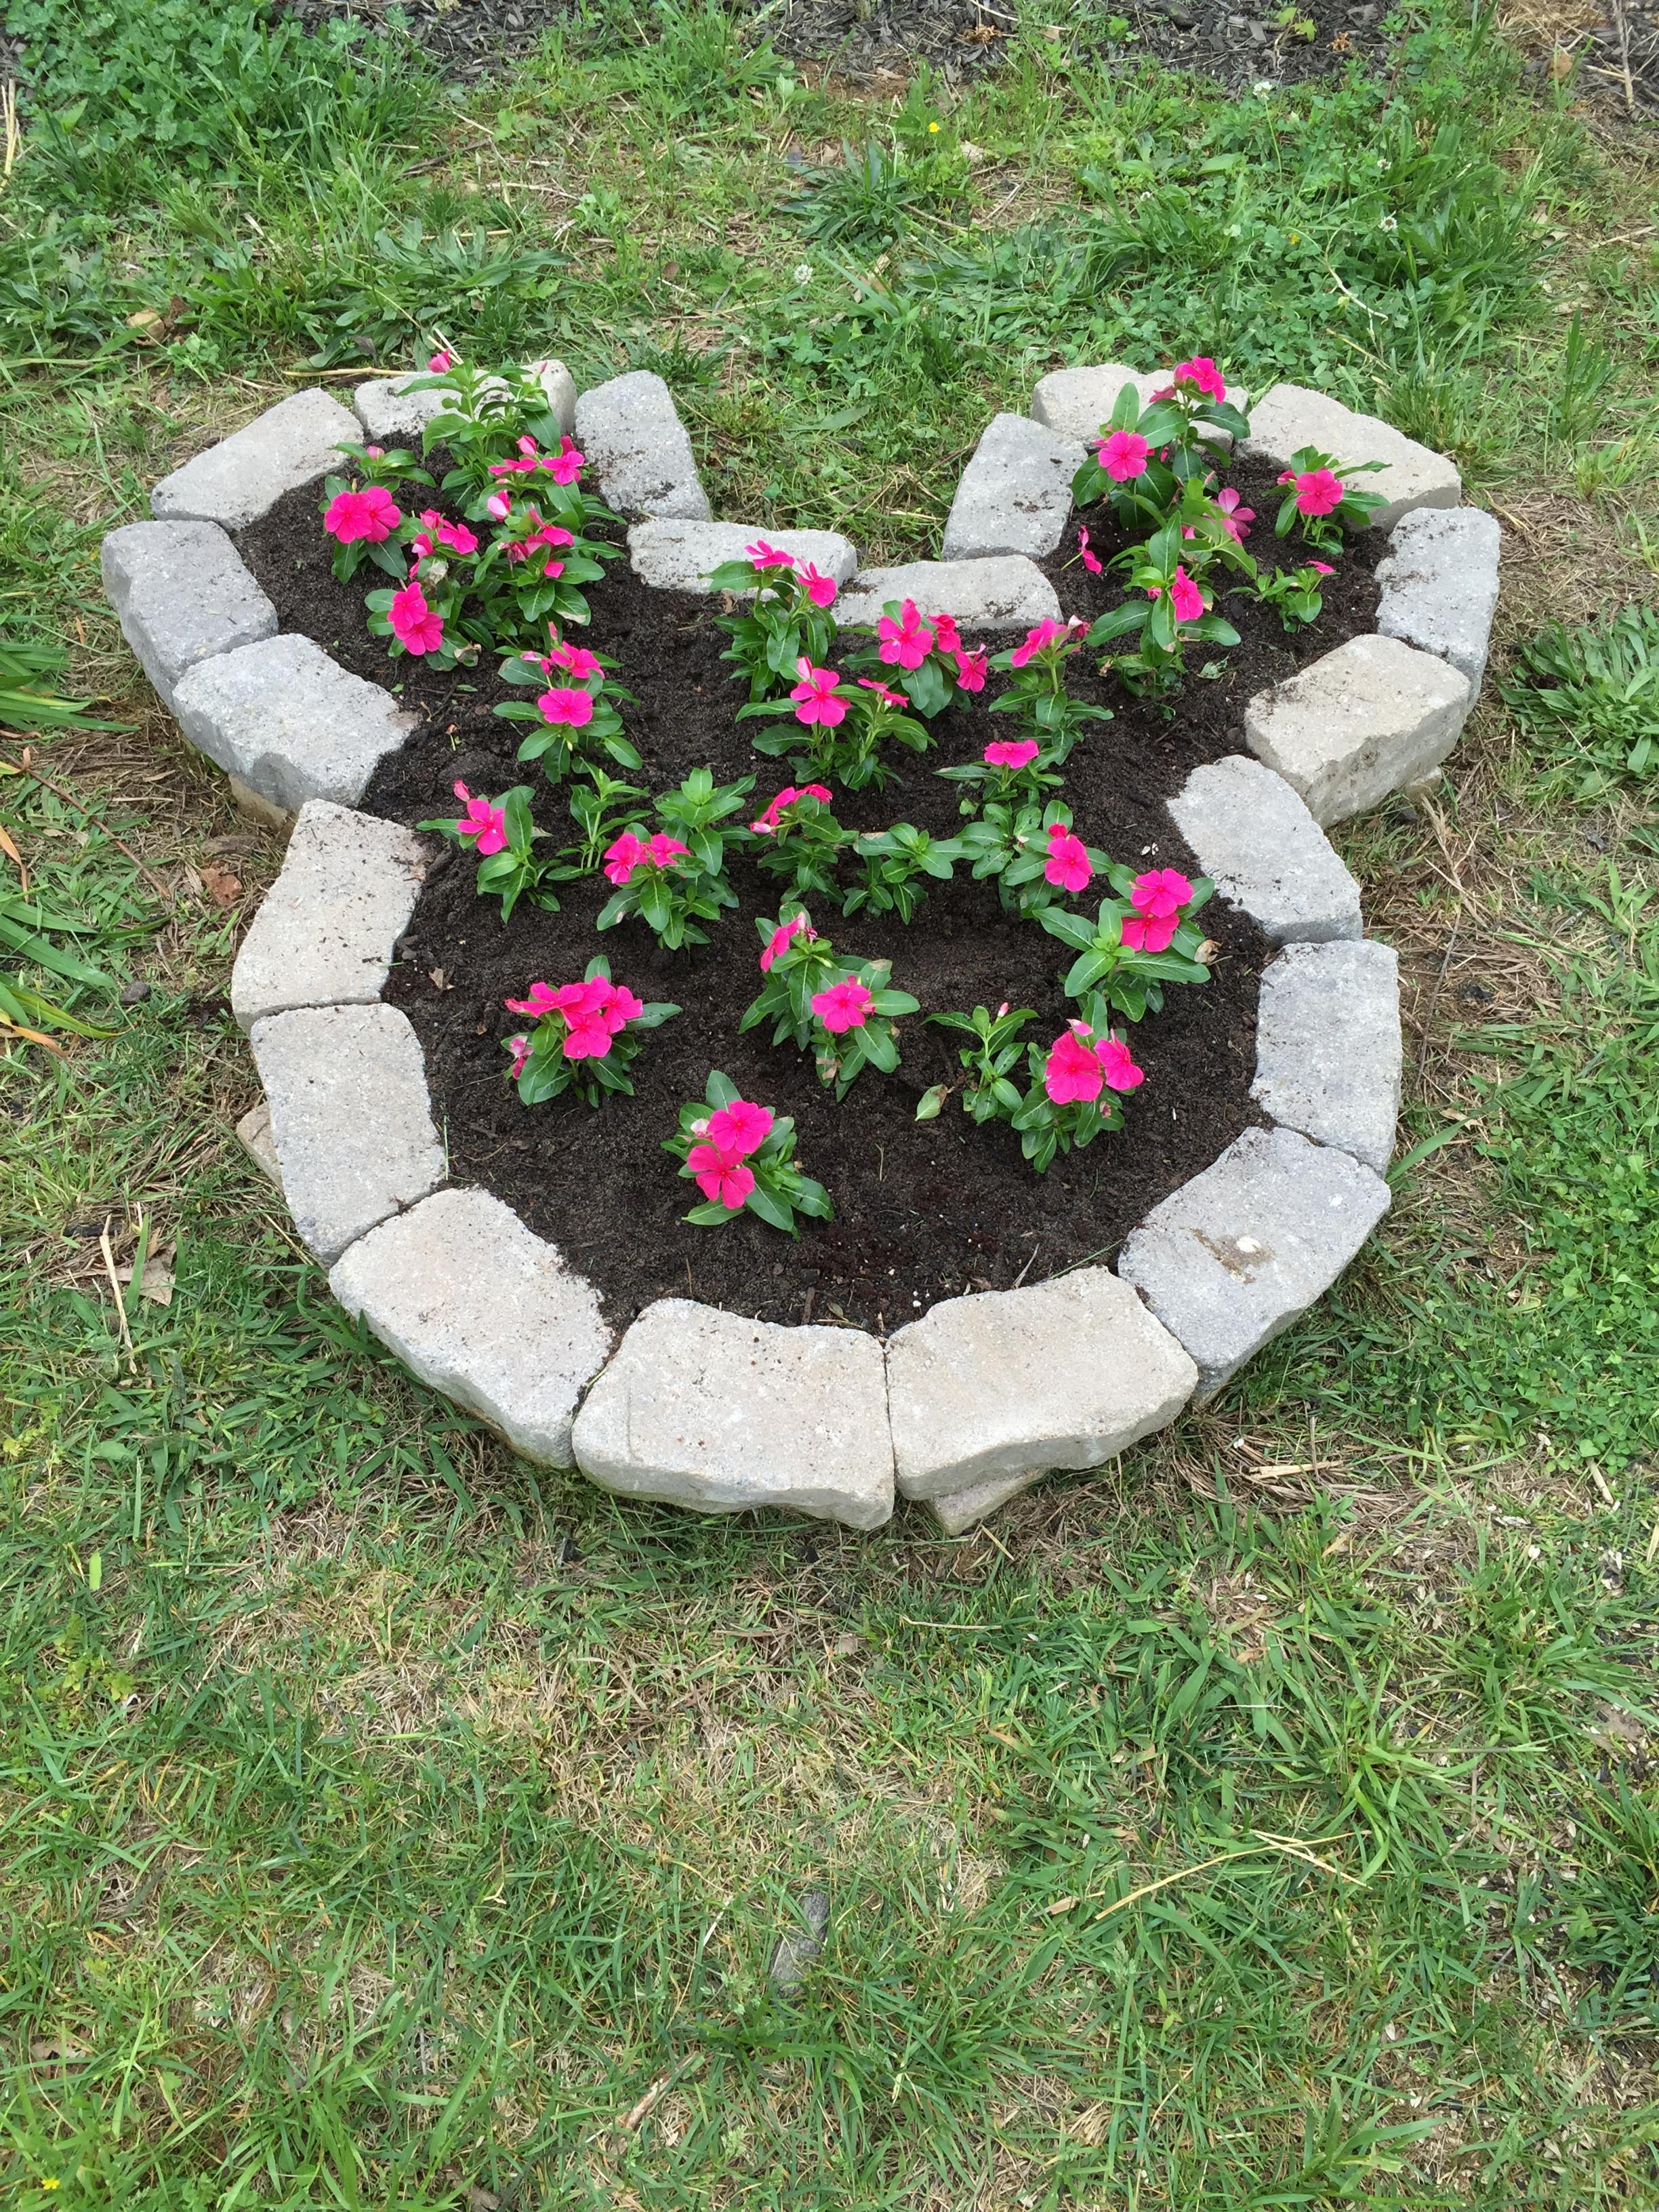 Best ideas about DIY Flower Garden . Save or Pin Disney DIY Mickey Head Flower Planter Now.